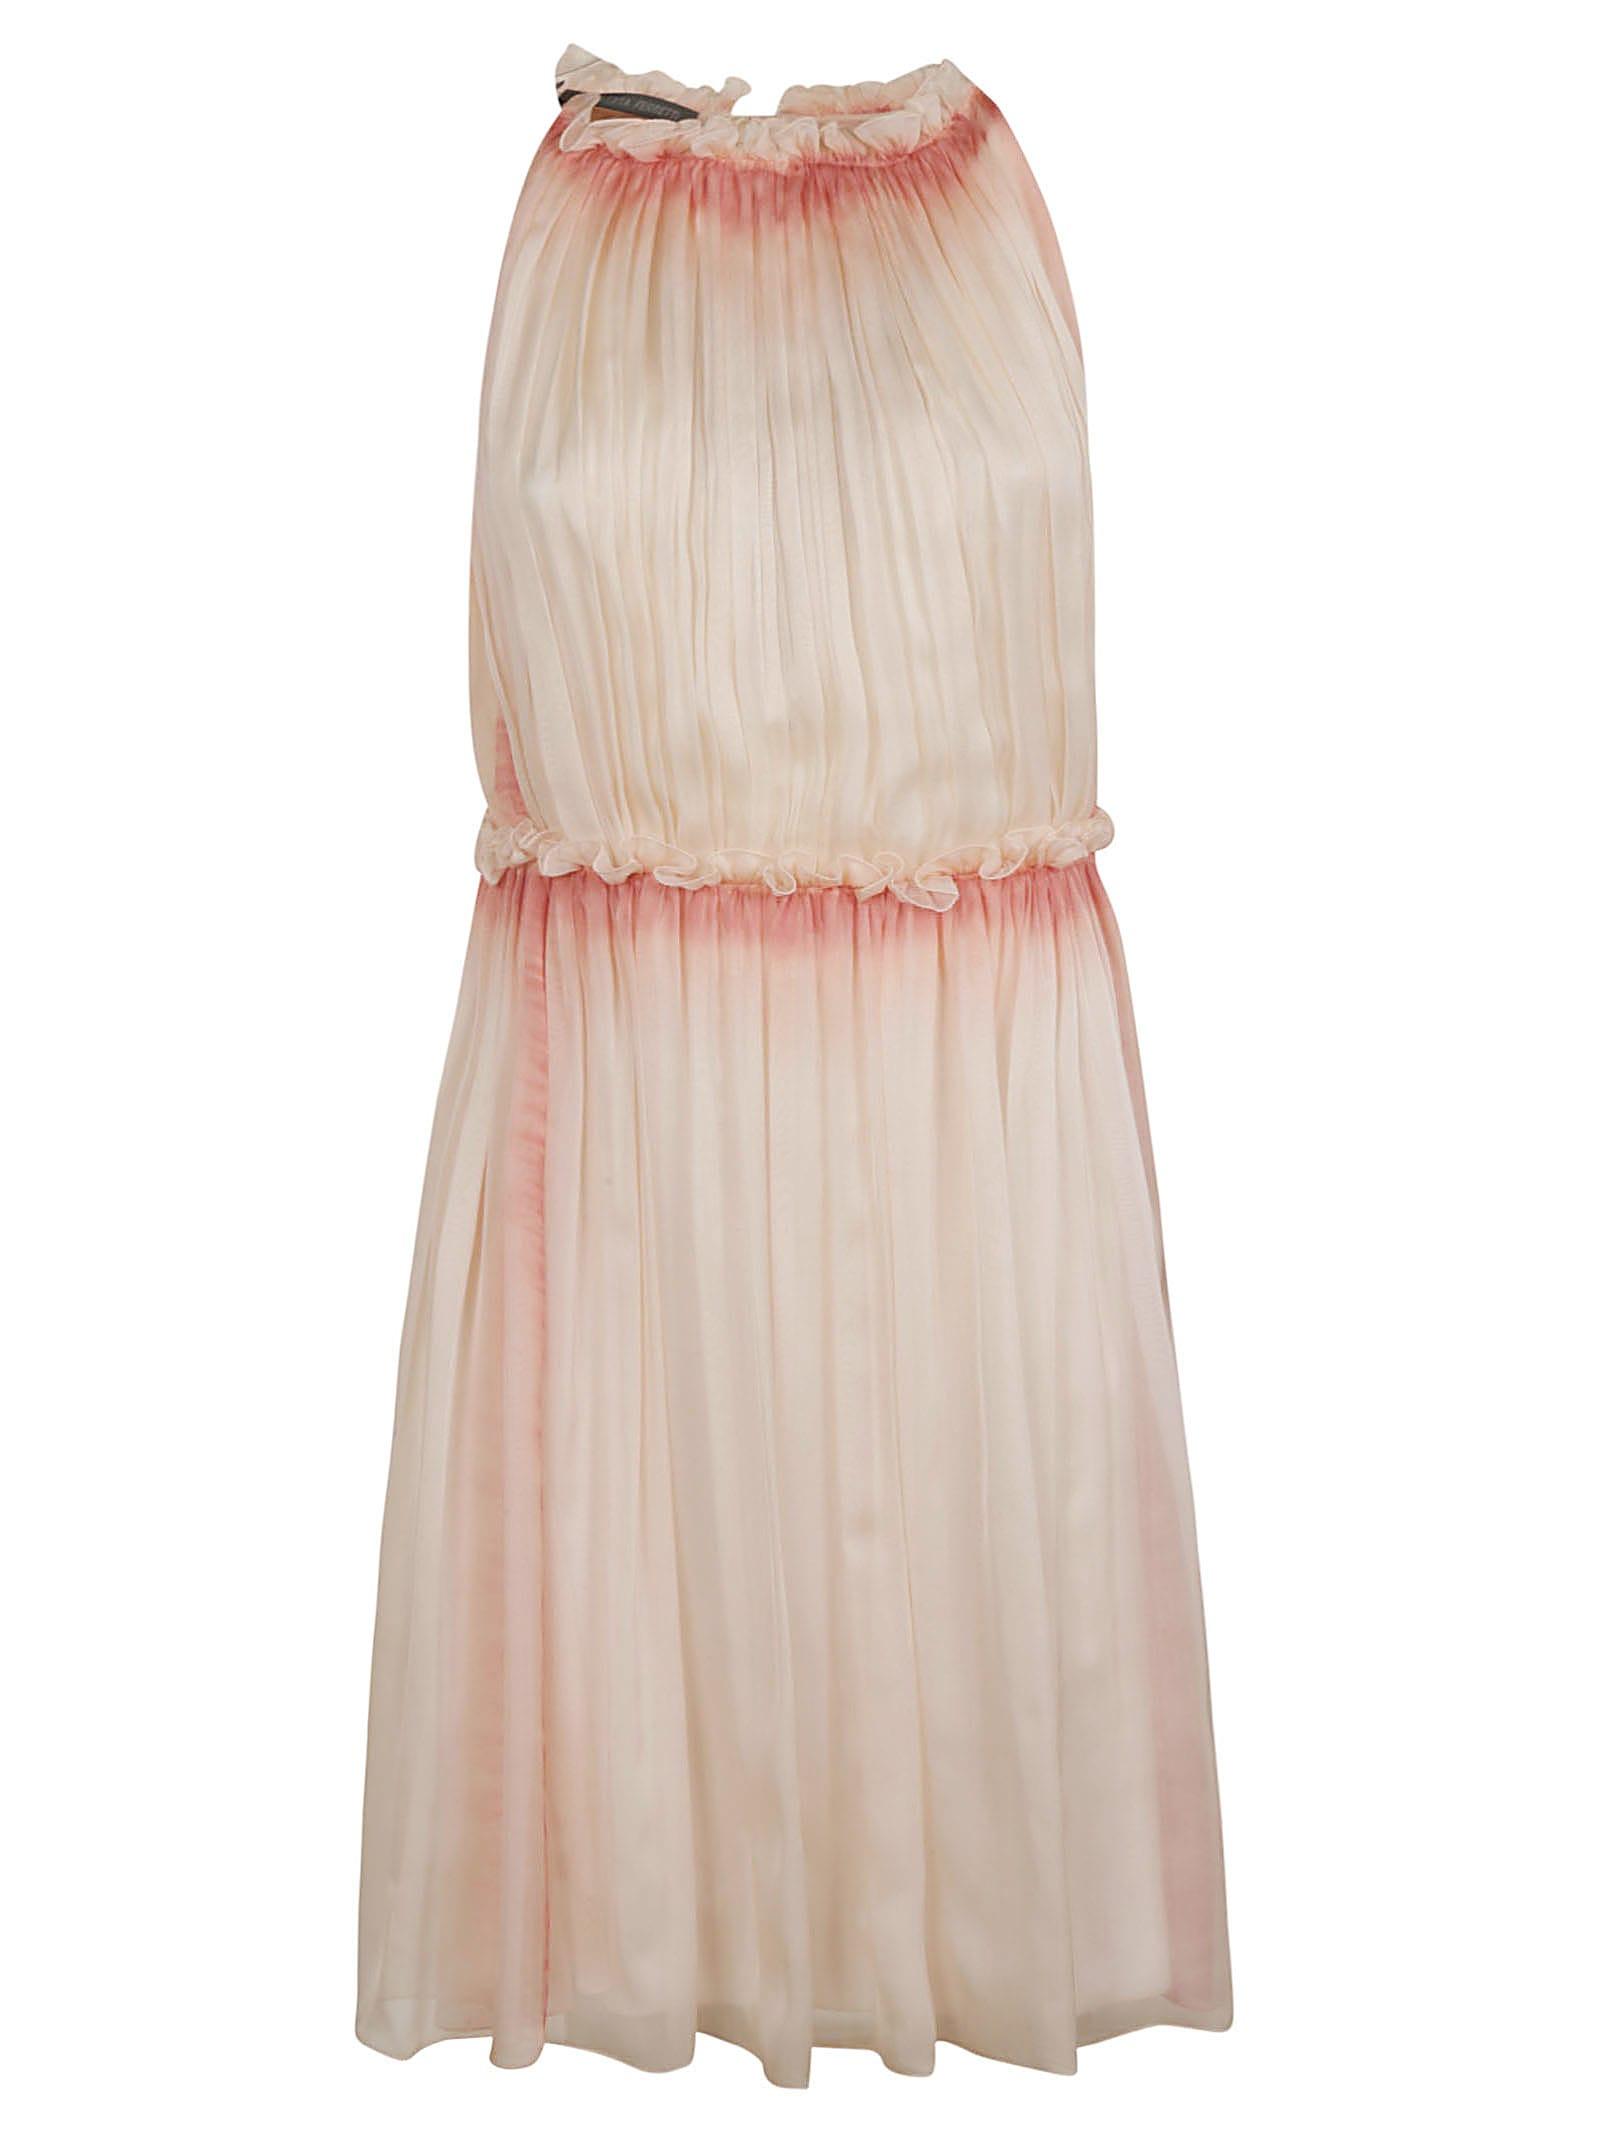 Alberta Ferretti Sleeveless Pleated Dress